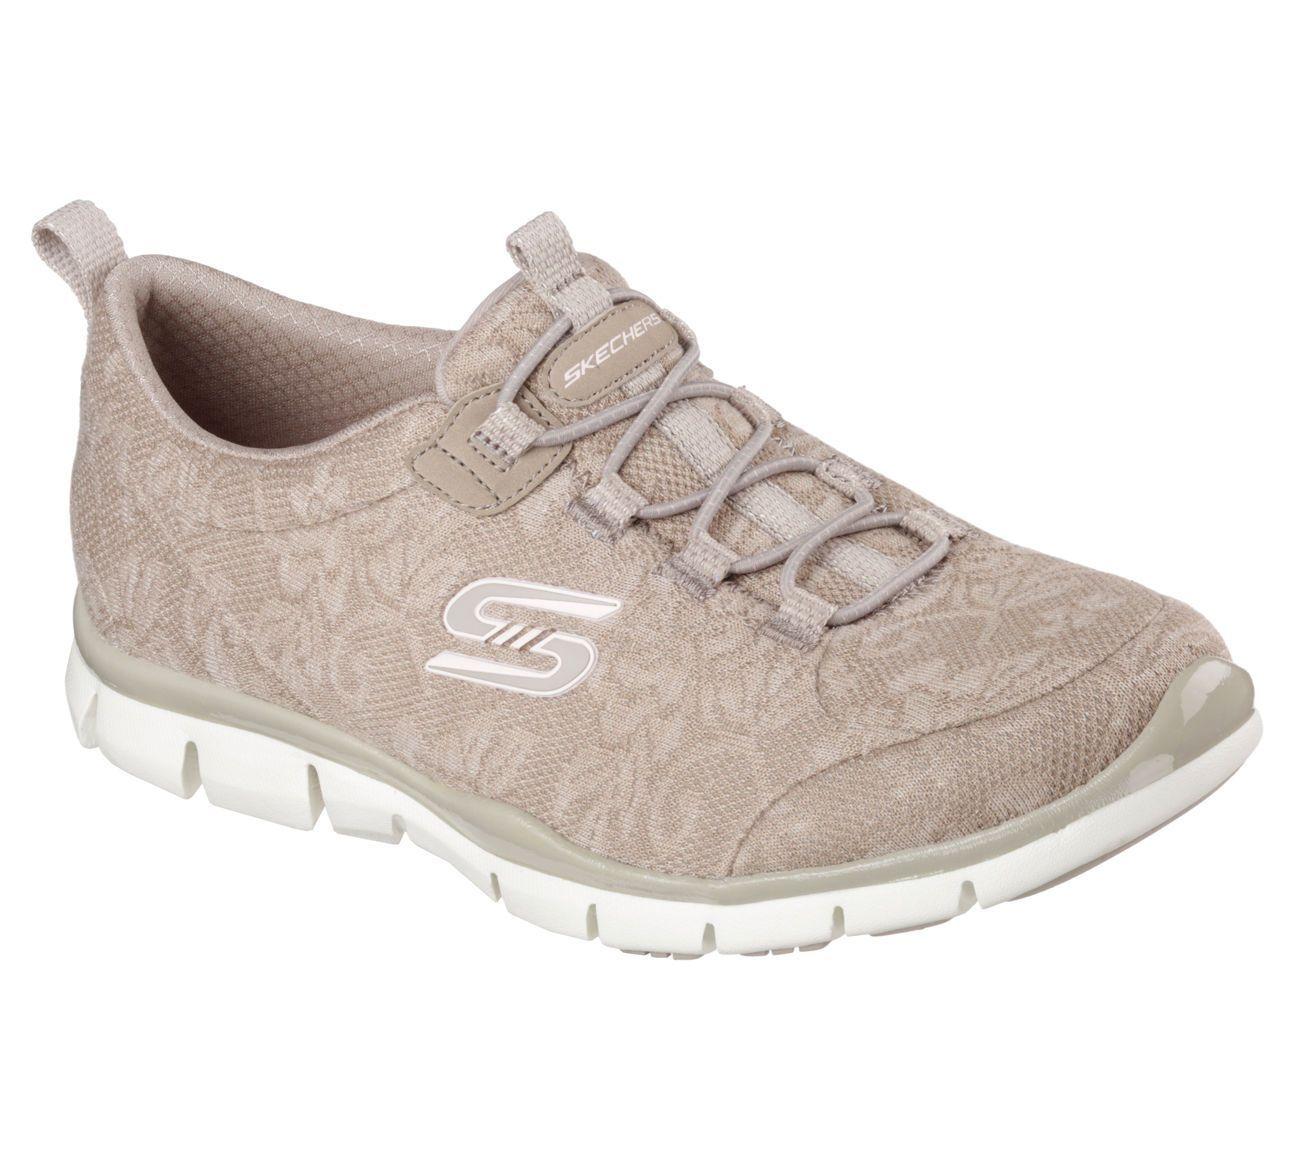 Skechers 22764, Sneakers Basses Femme - Beige - Taupe, 22,5 EU